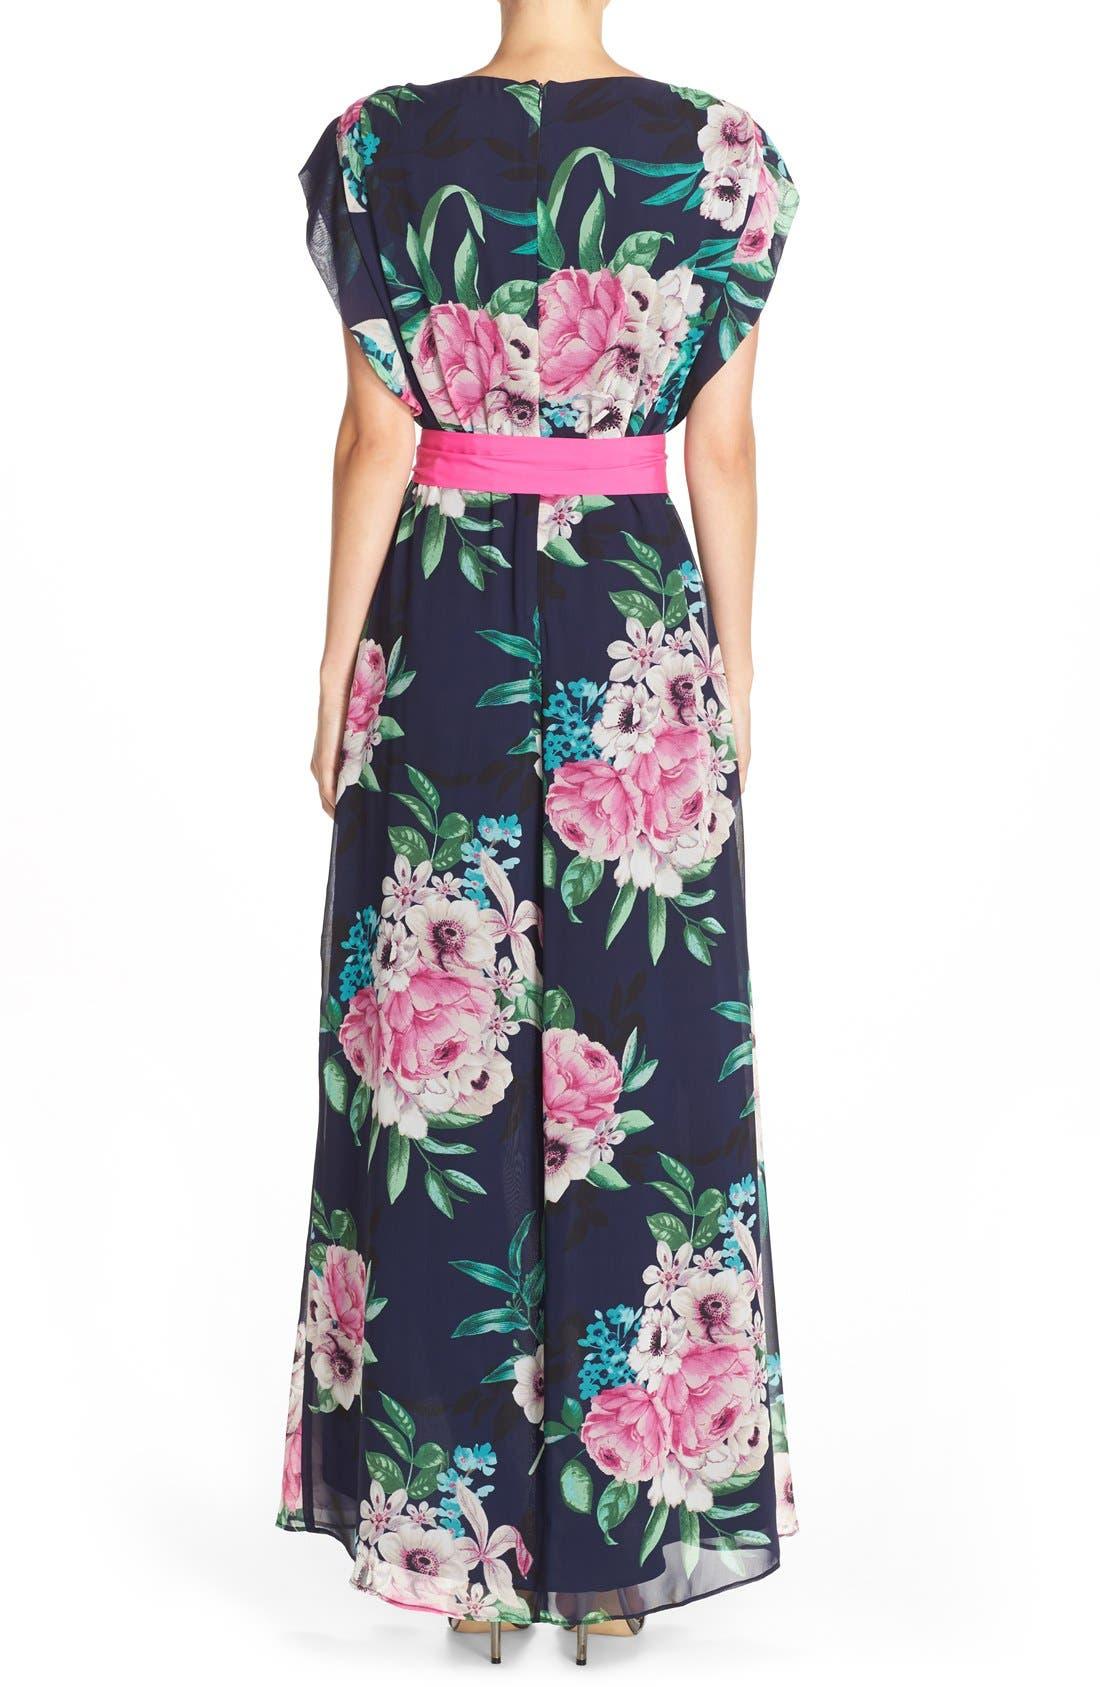 ELIZA J, Floral Print Chiffon High/Low Dress, Alternate thumbnail 3, color, 470